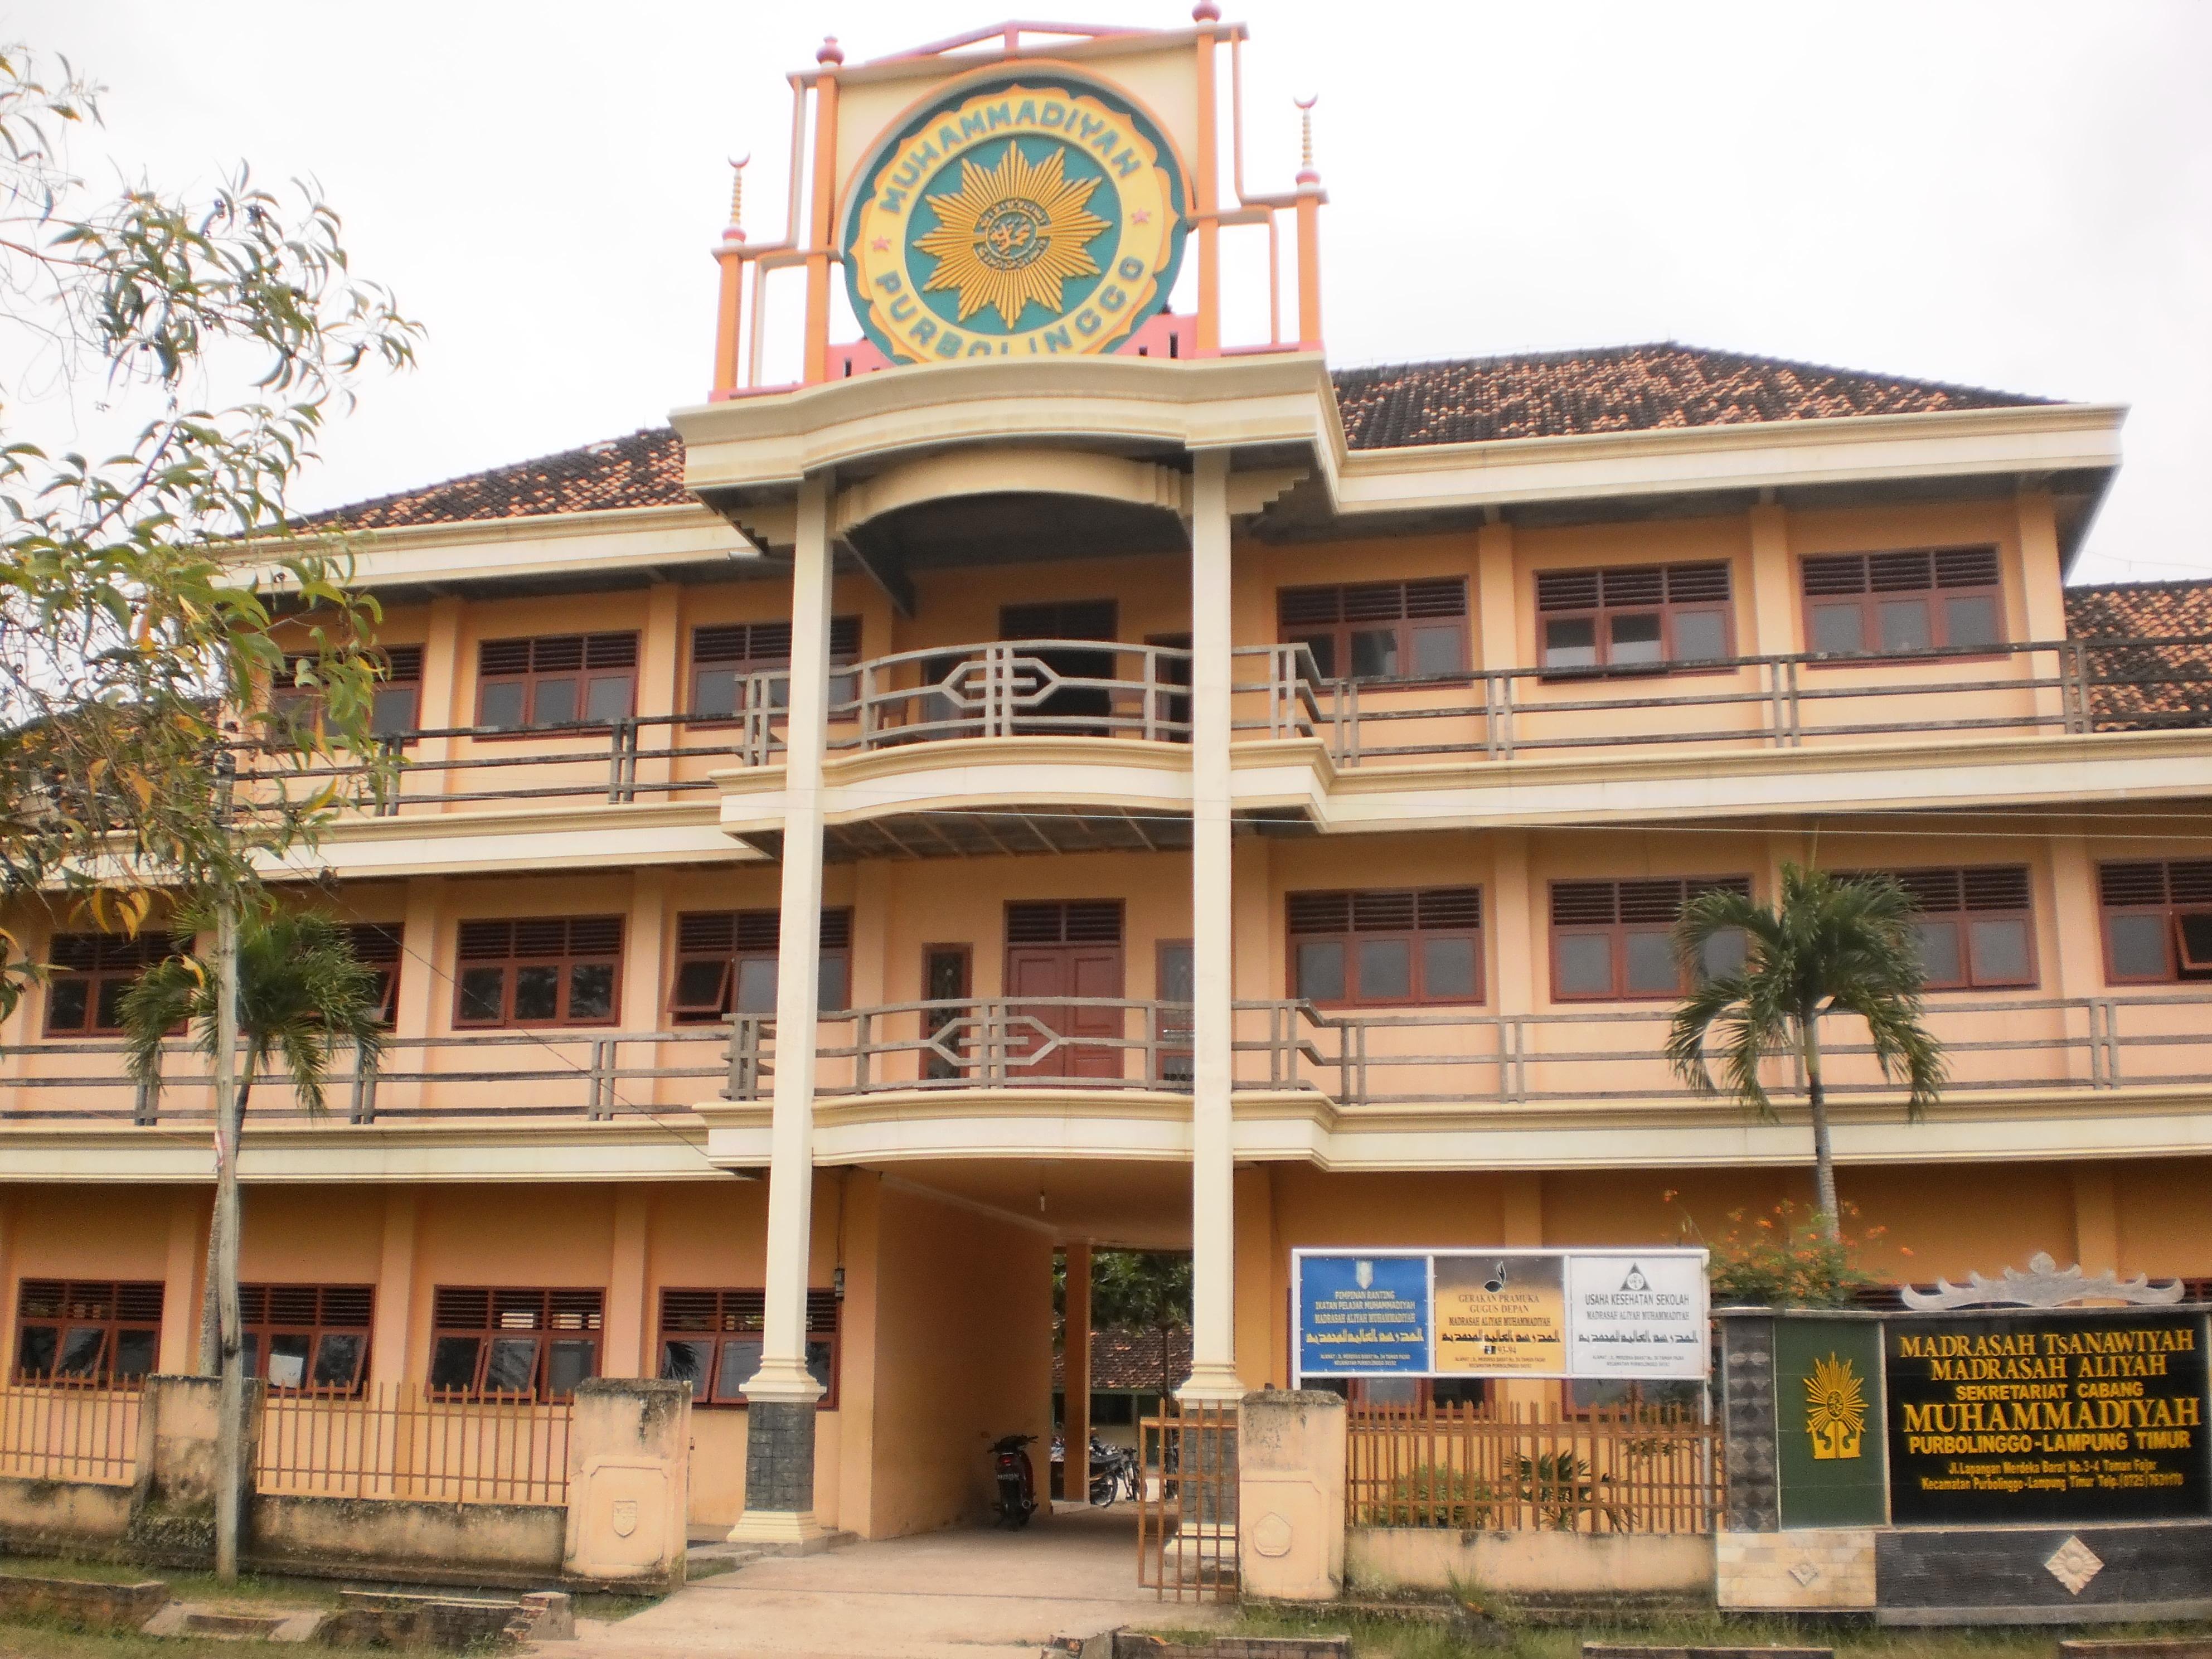 Gedung Ma Muhammadiyah Purbolinggo Marhenyantoz S Blog